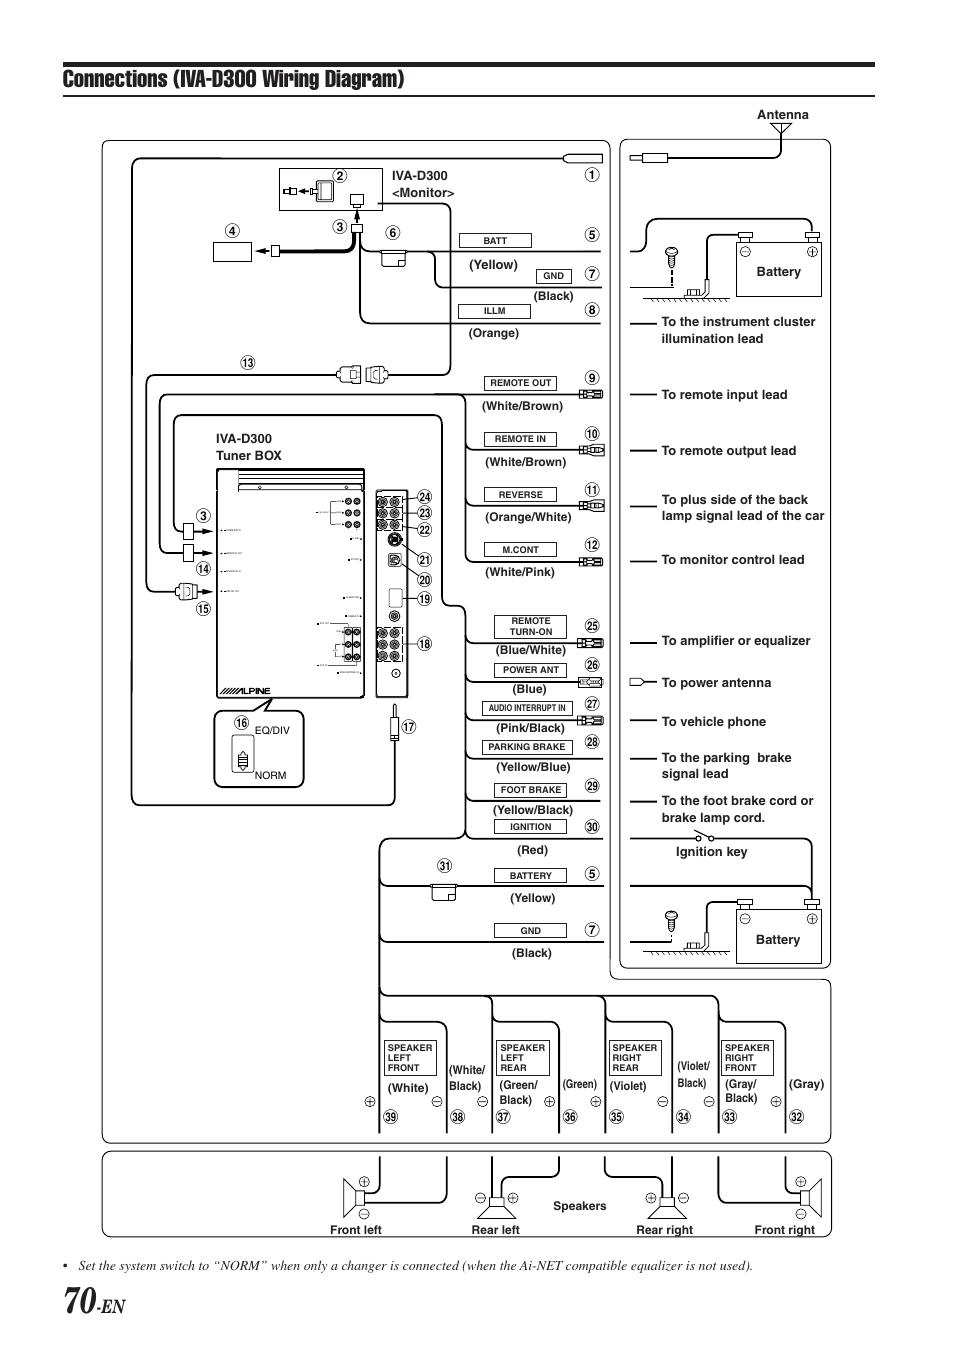 medium resolution of alpine iva w205 wiring diagram wiring diagram data today alpine dvd wiring diagram